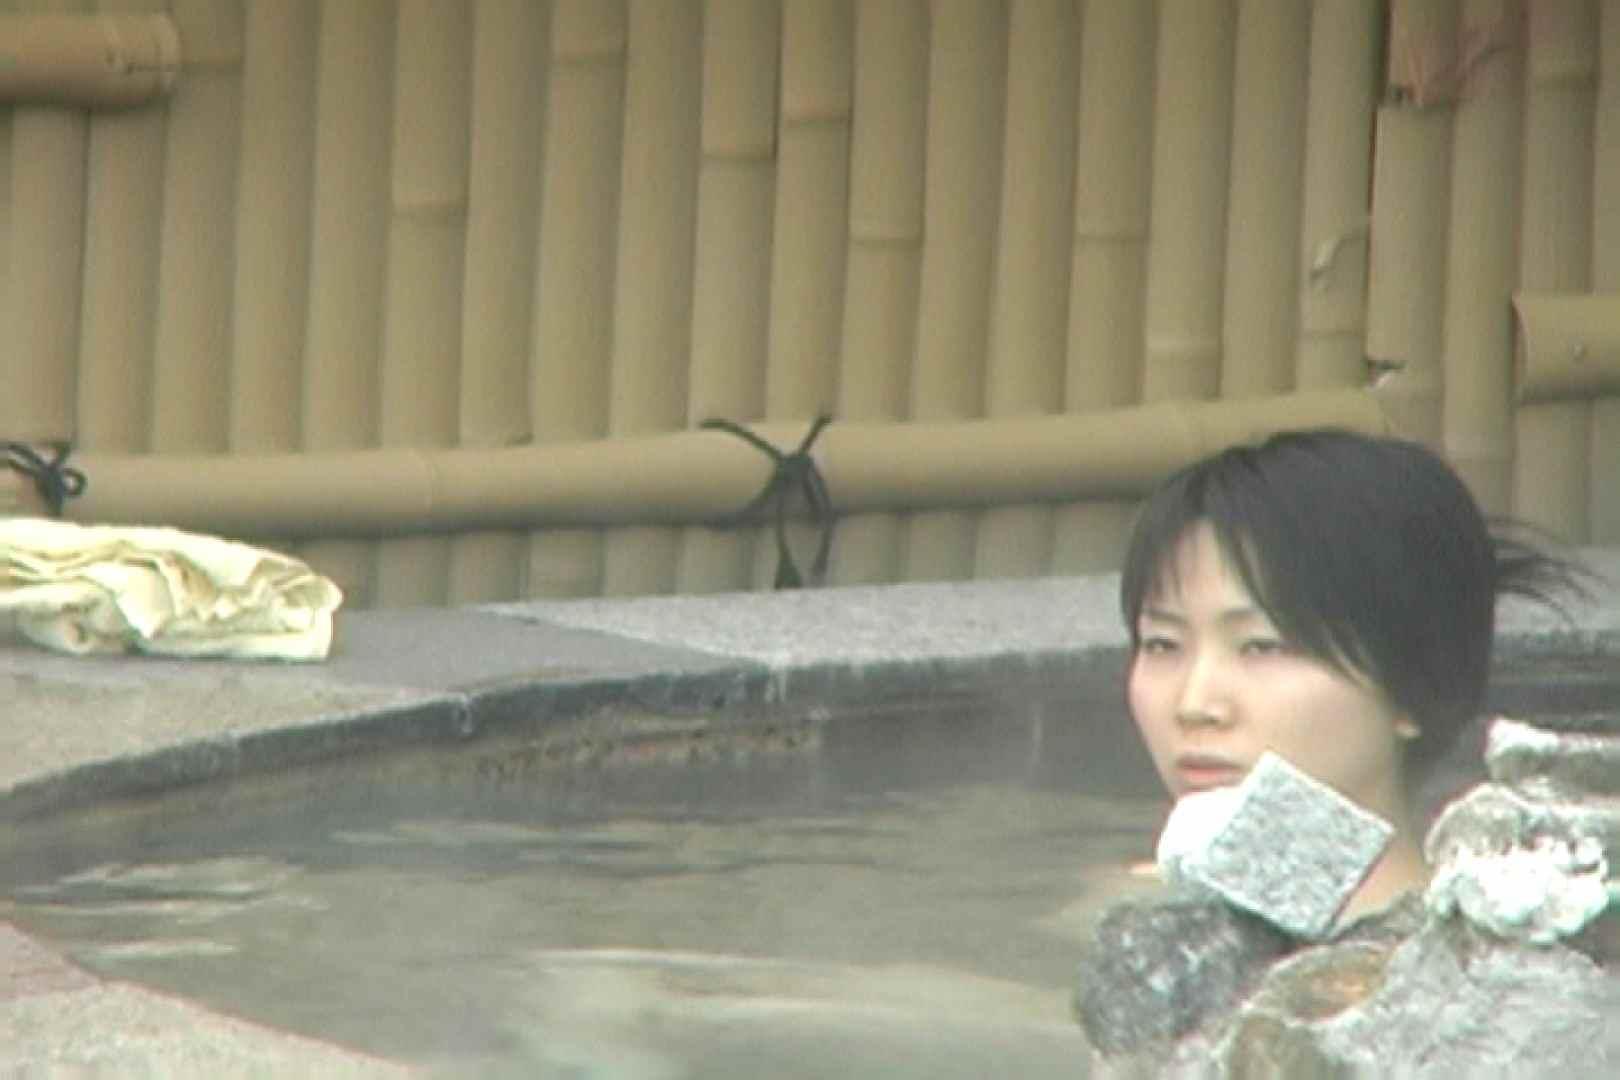 Aquaな露天風呂Vol.567 0 | 0  105連発 5